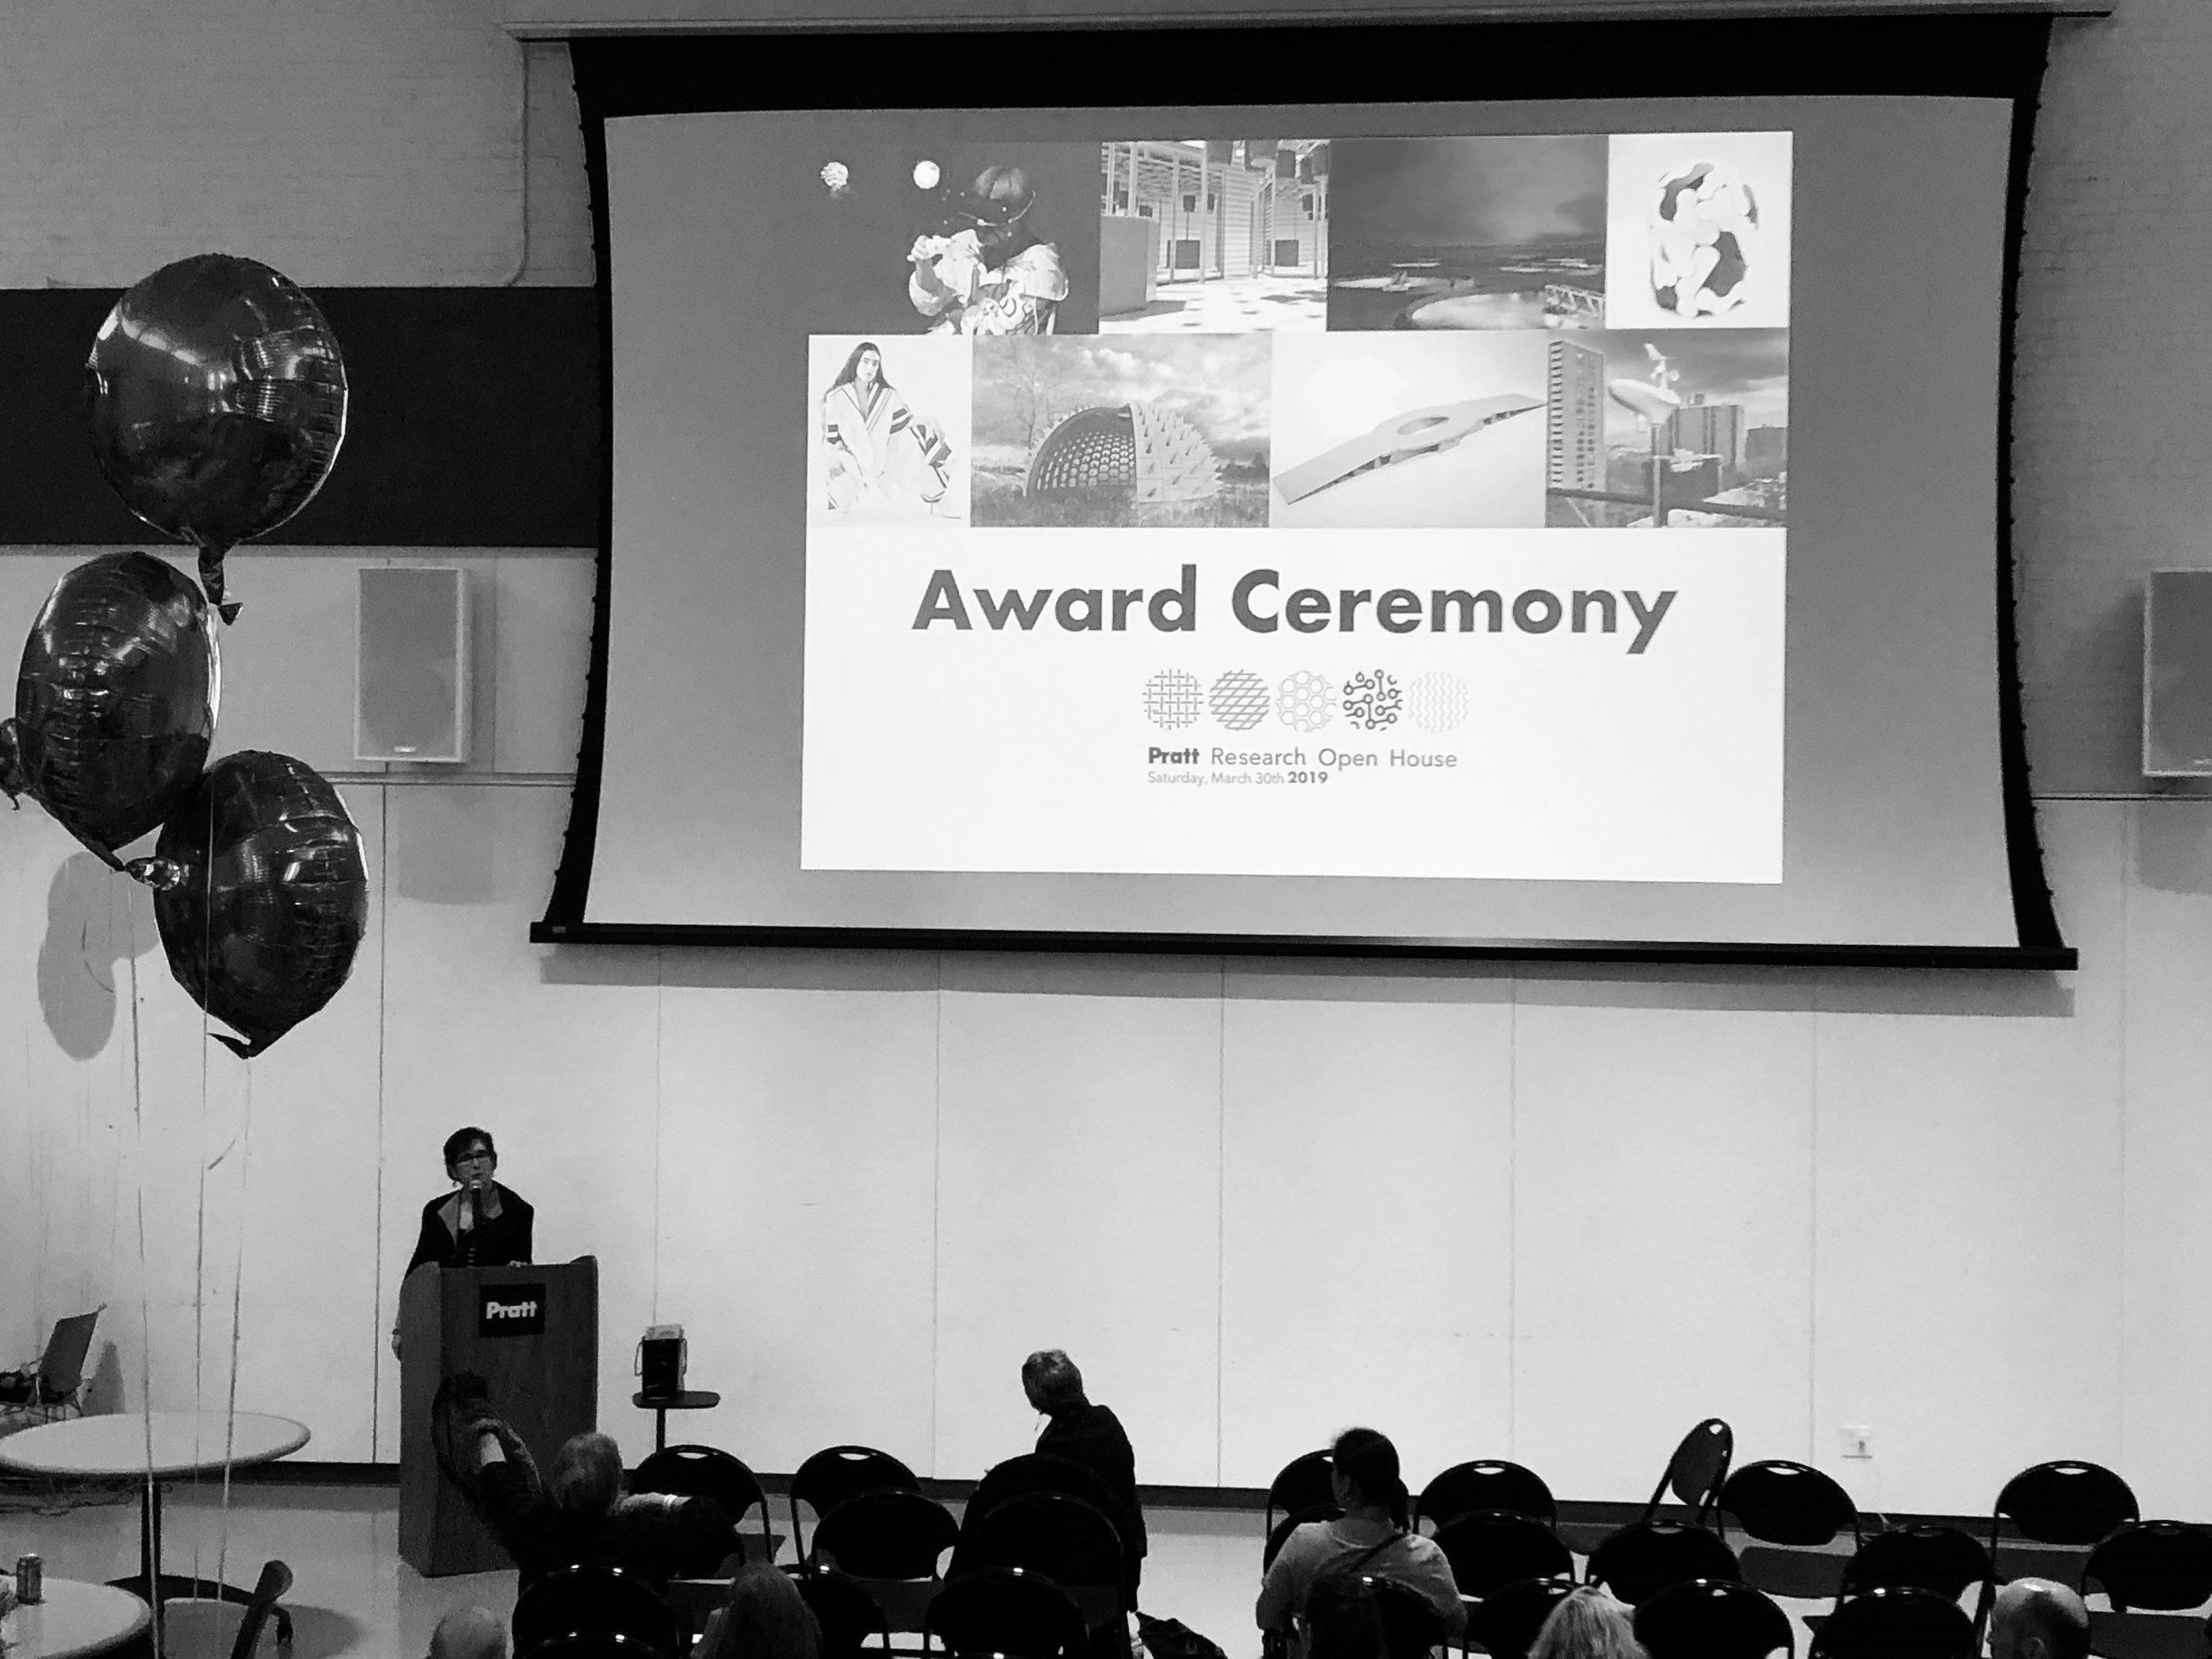 Pratt Institute Research Open House, Pollinators Pavilion awarded, 2019